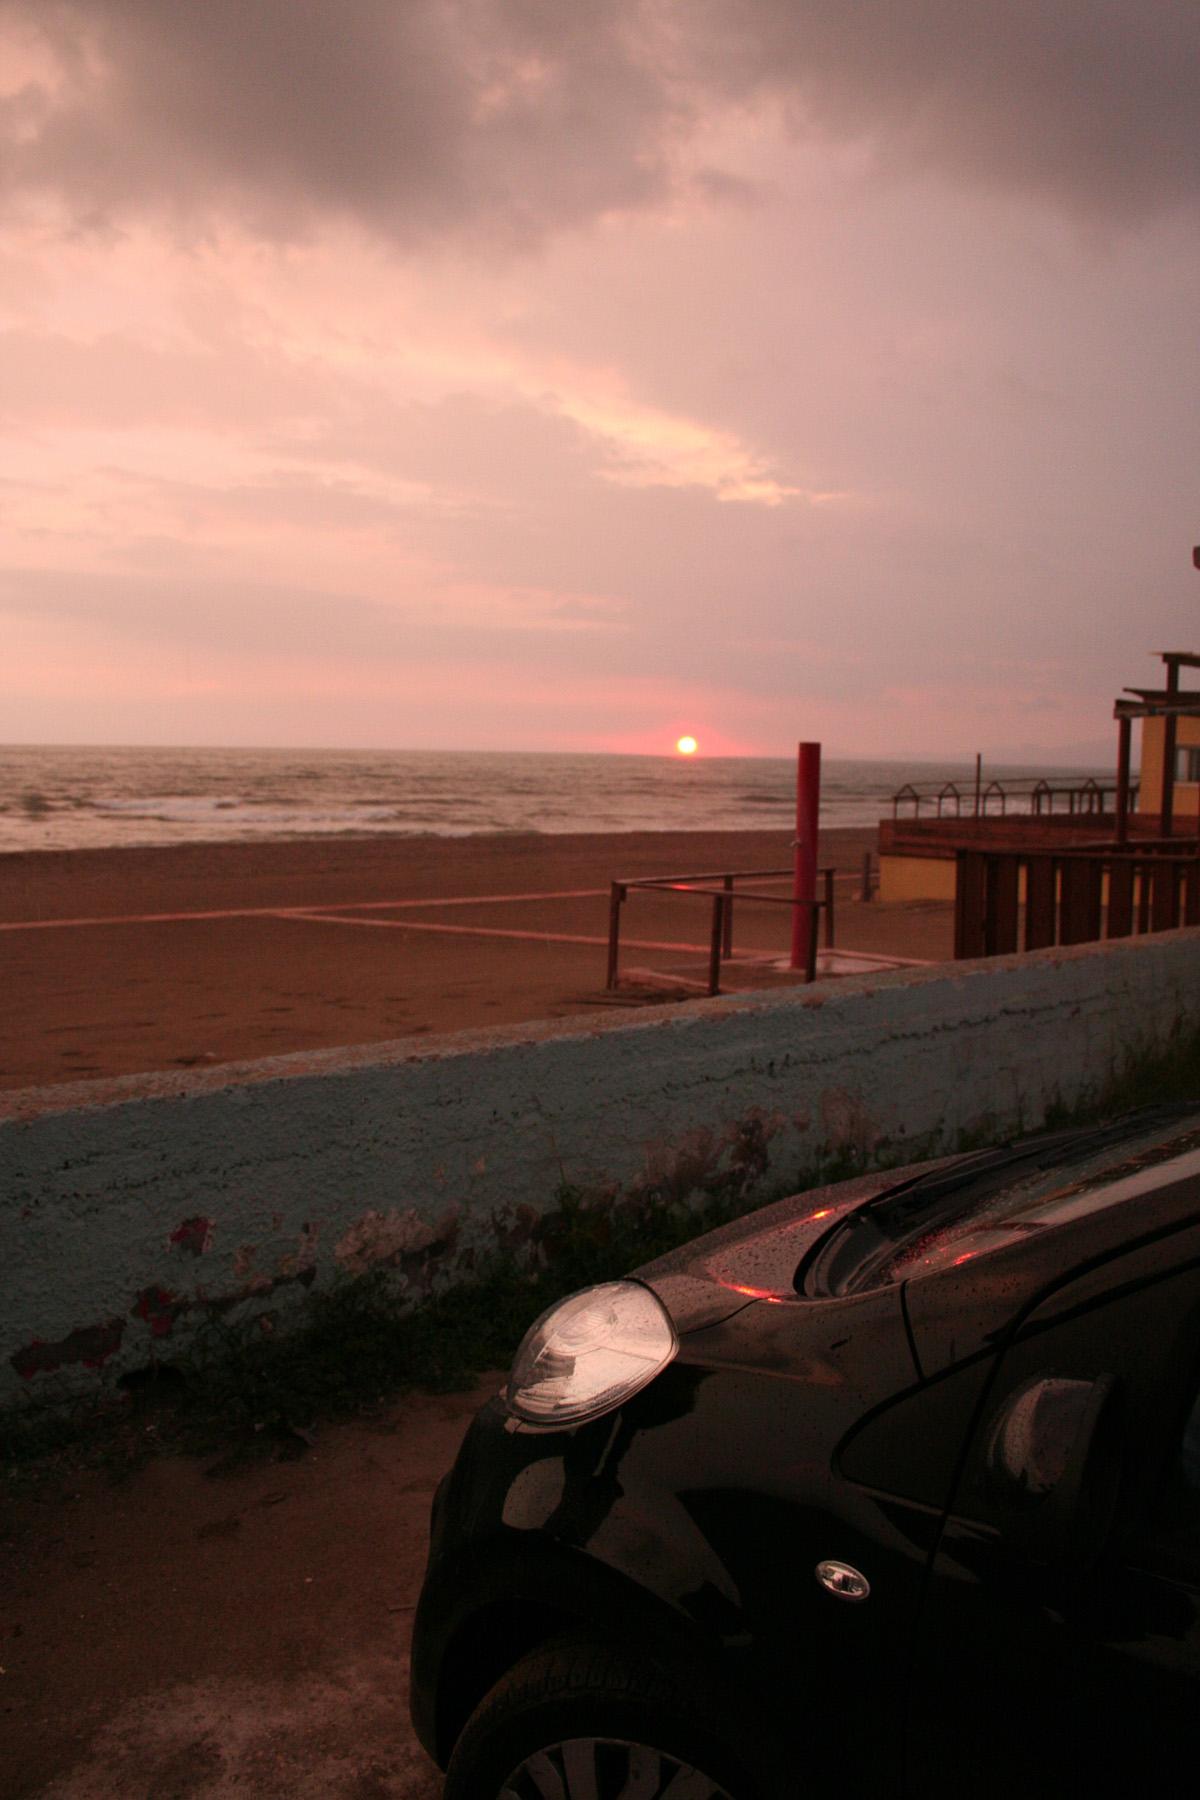 Sunset Car, Beach, Bspo06, Car, Clouds, HQ Photo